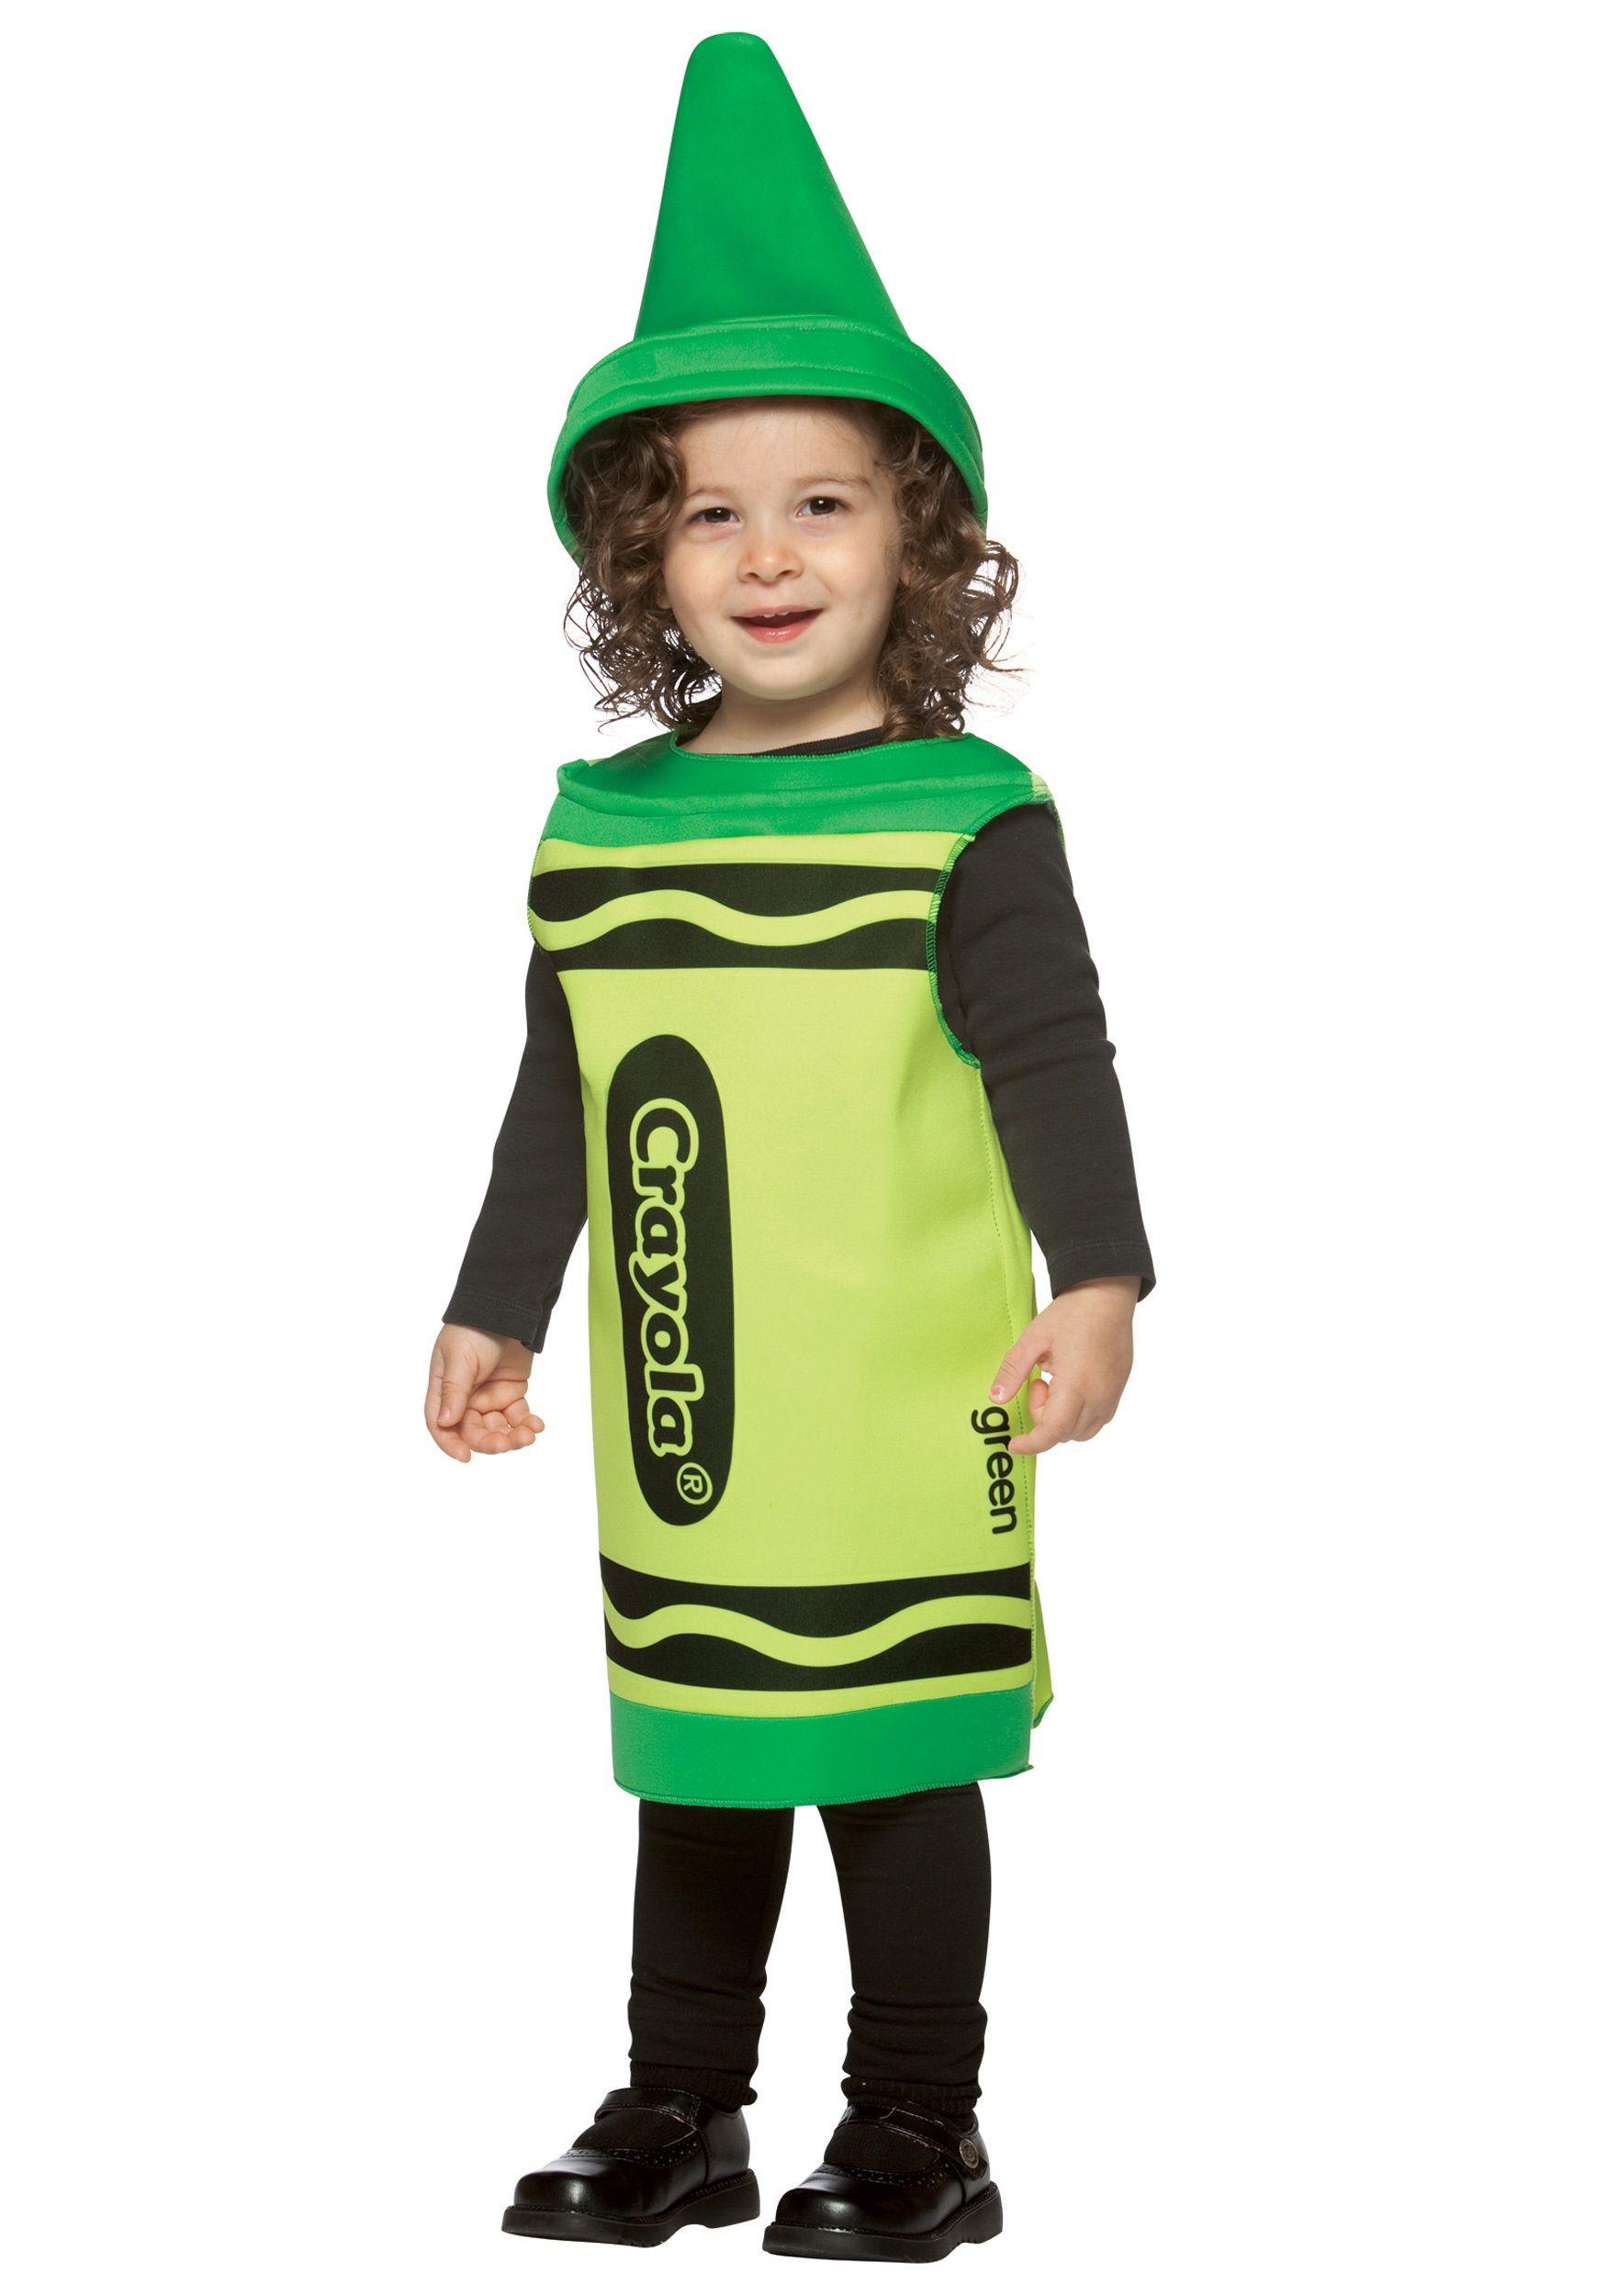 Toddler Green Crayon Costume Crayon costume, Toddler